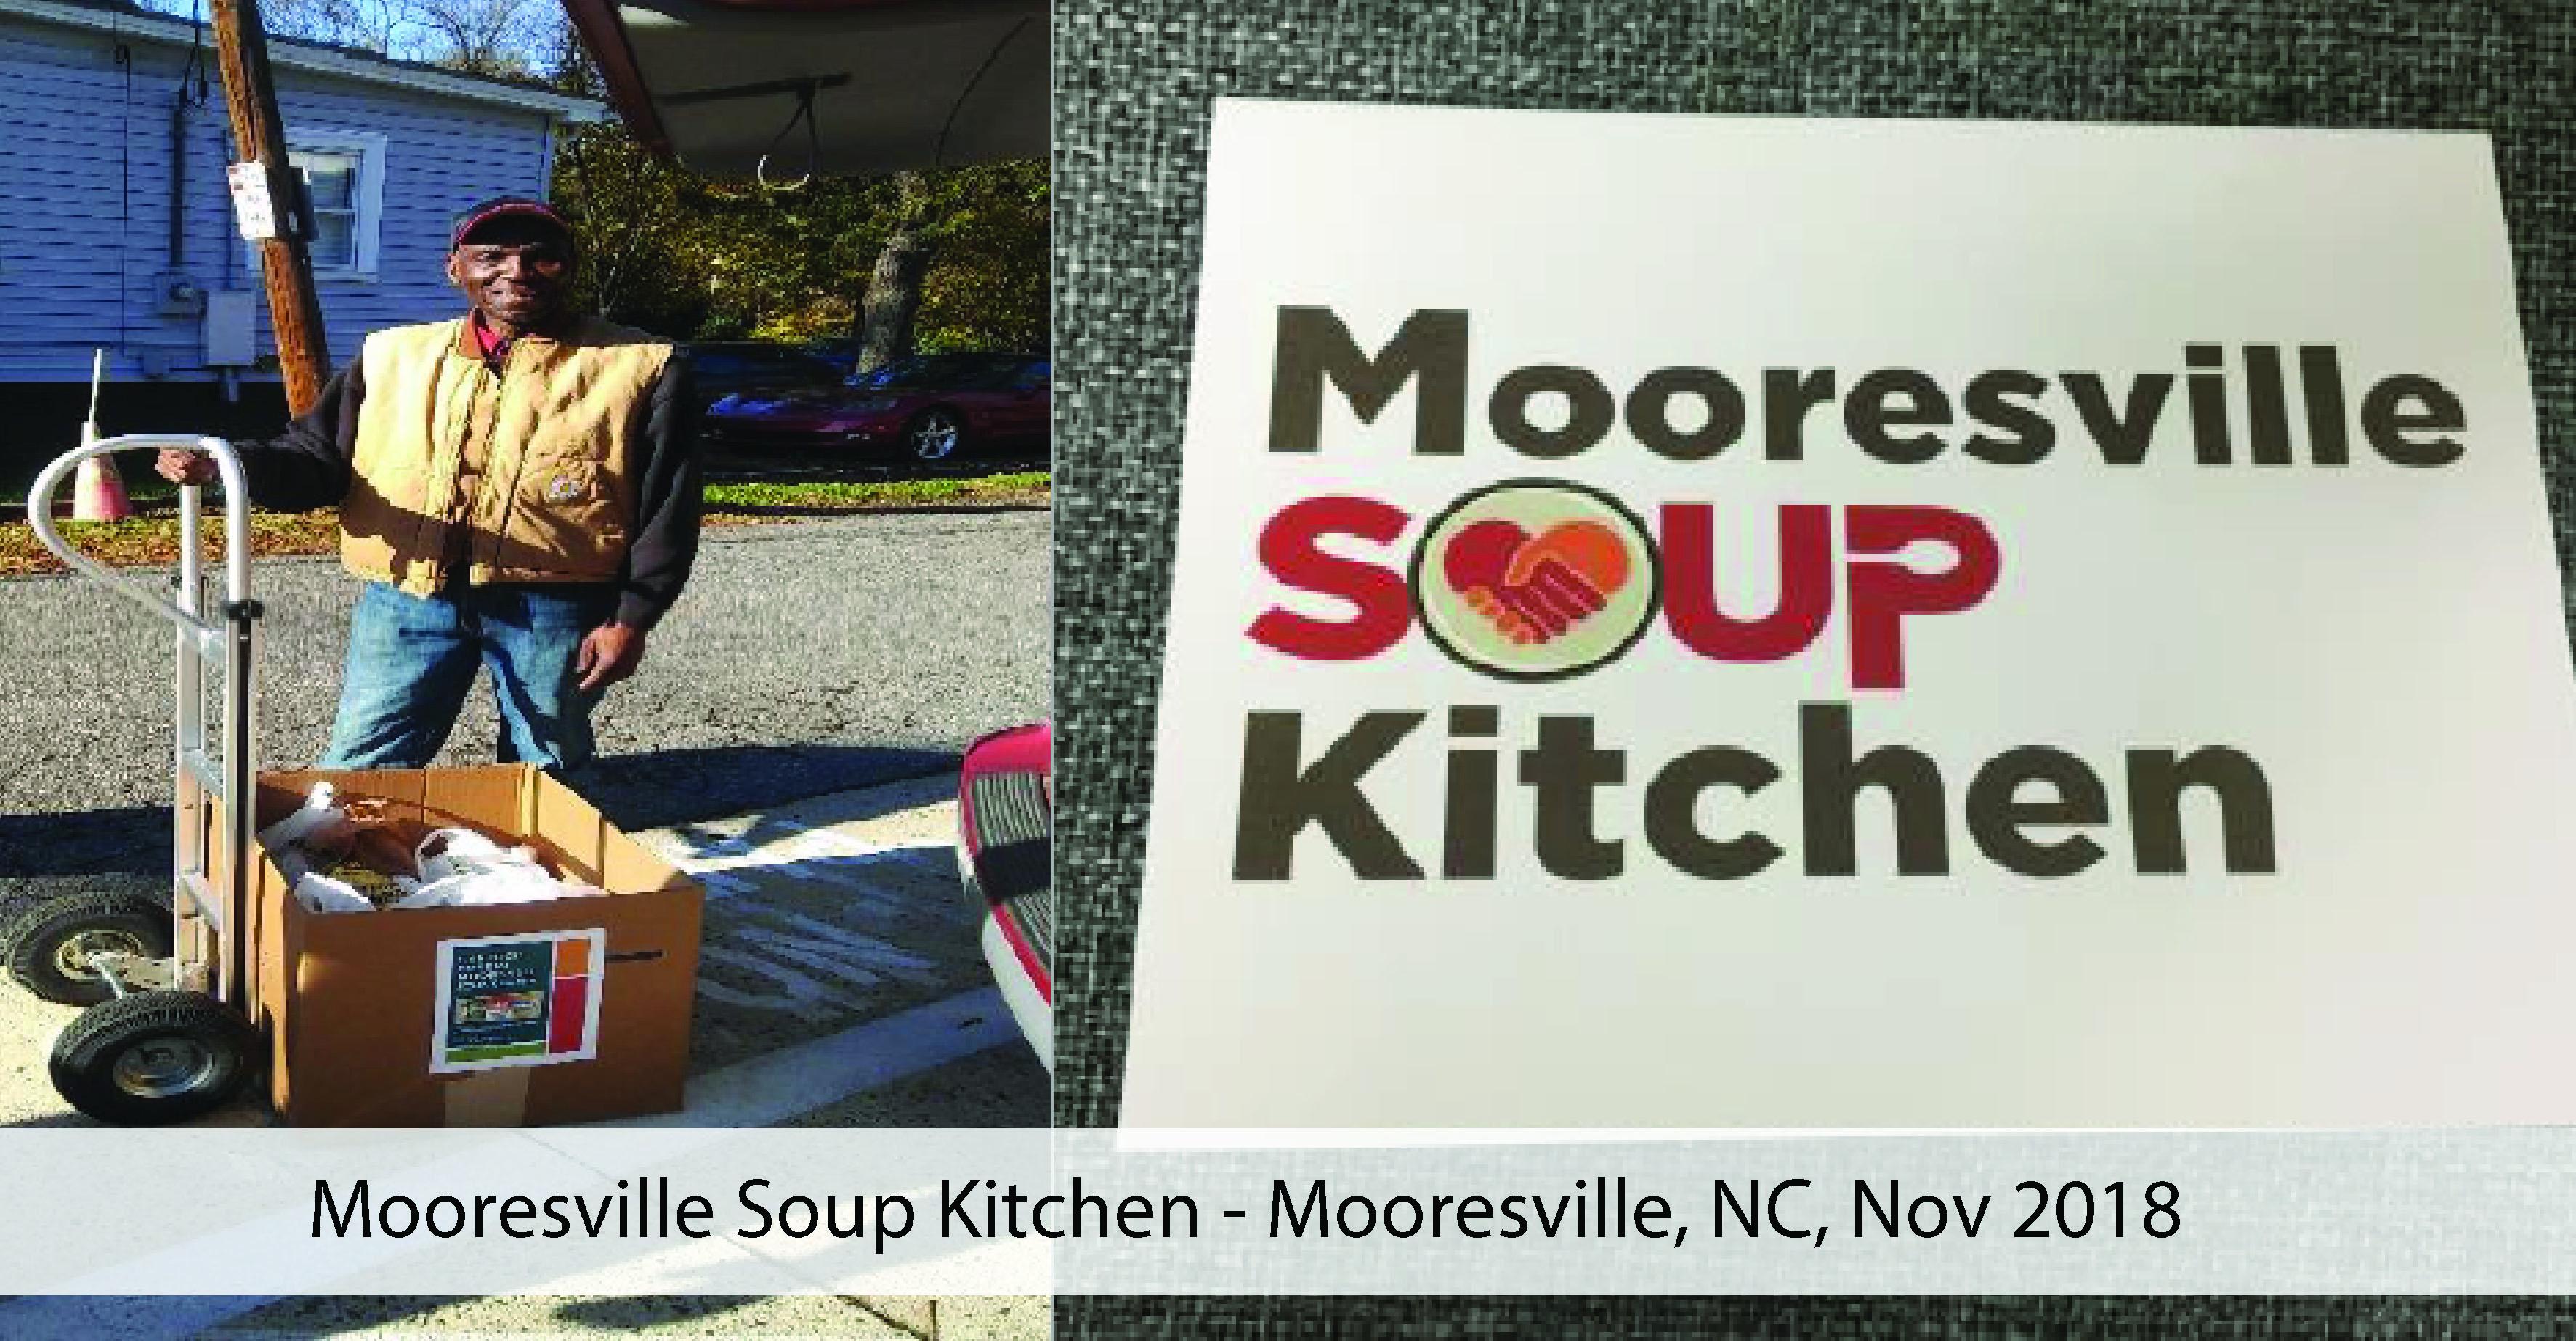 Mooresville Soup Kitchen 2018